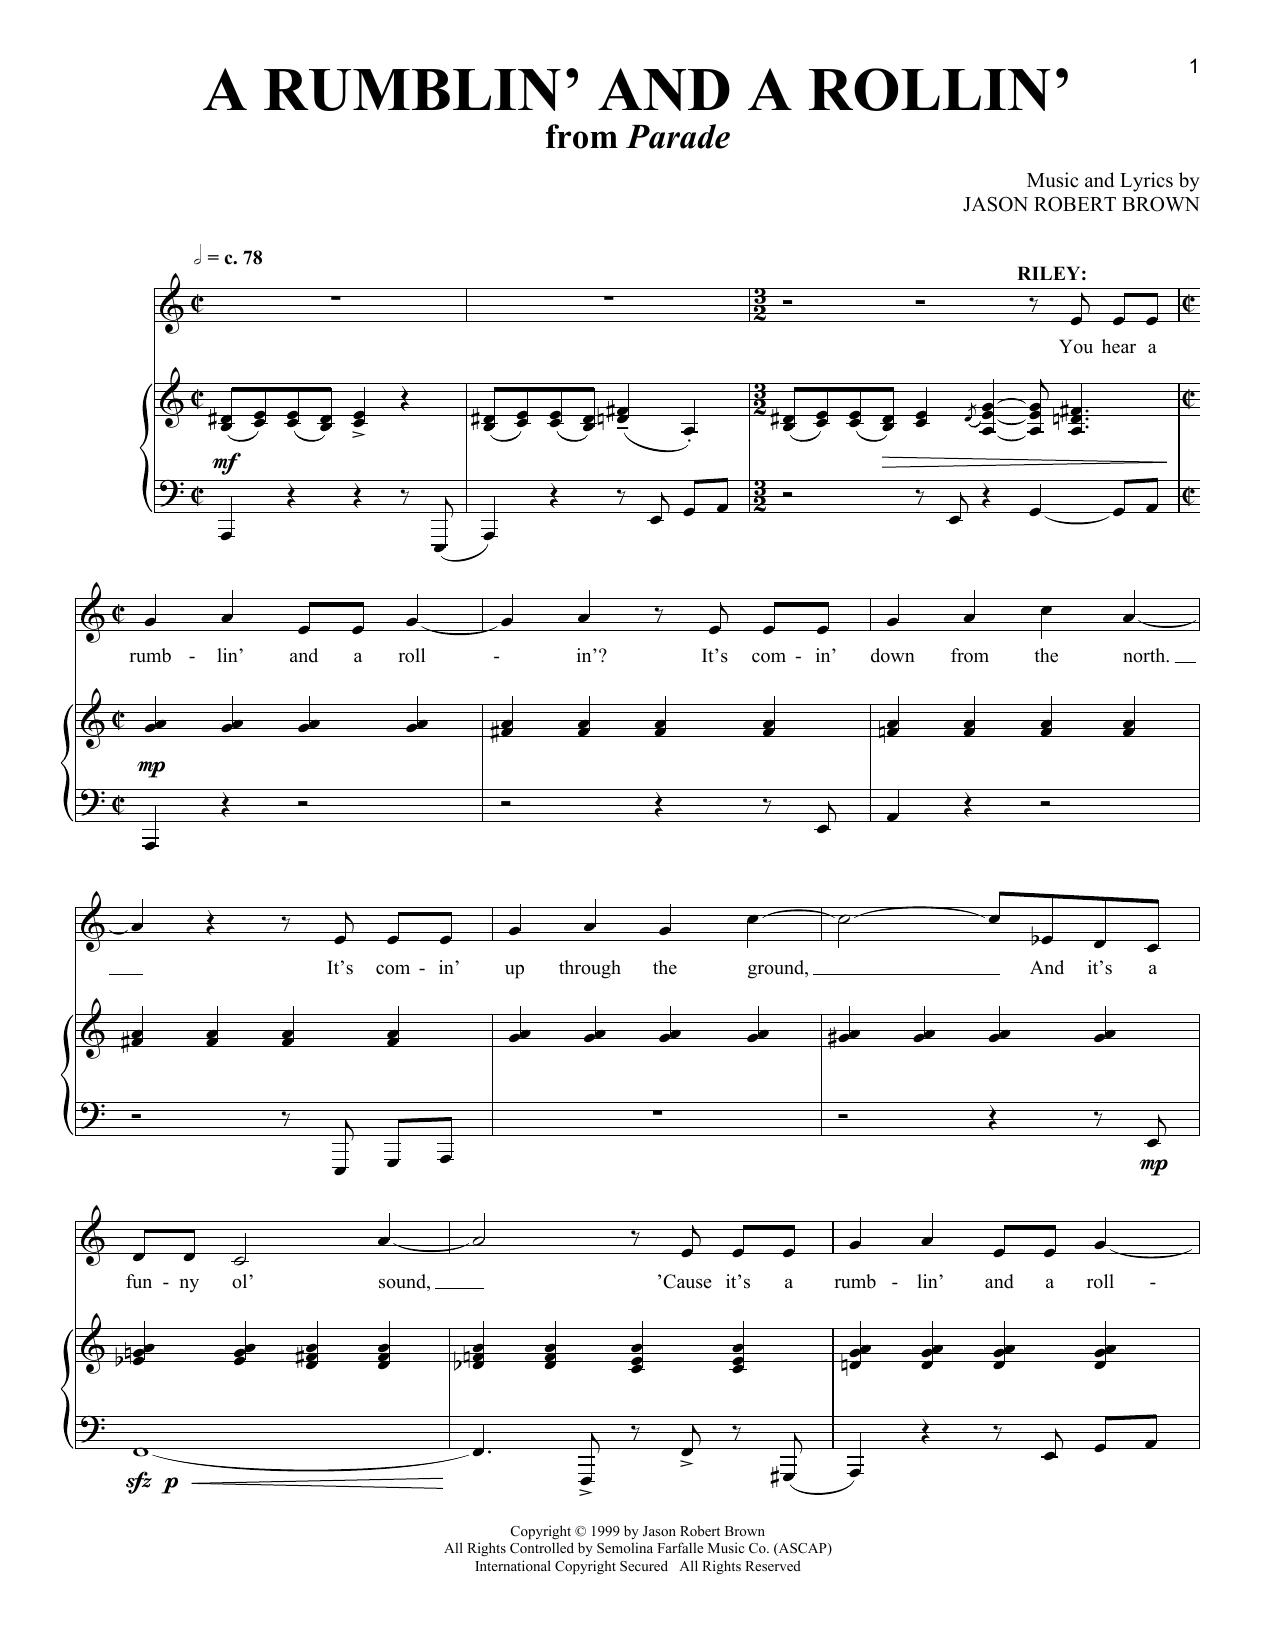 A Rumblin' And A Rollin' Sheet Music